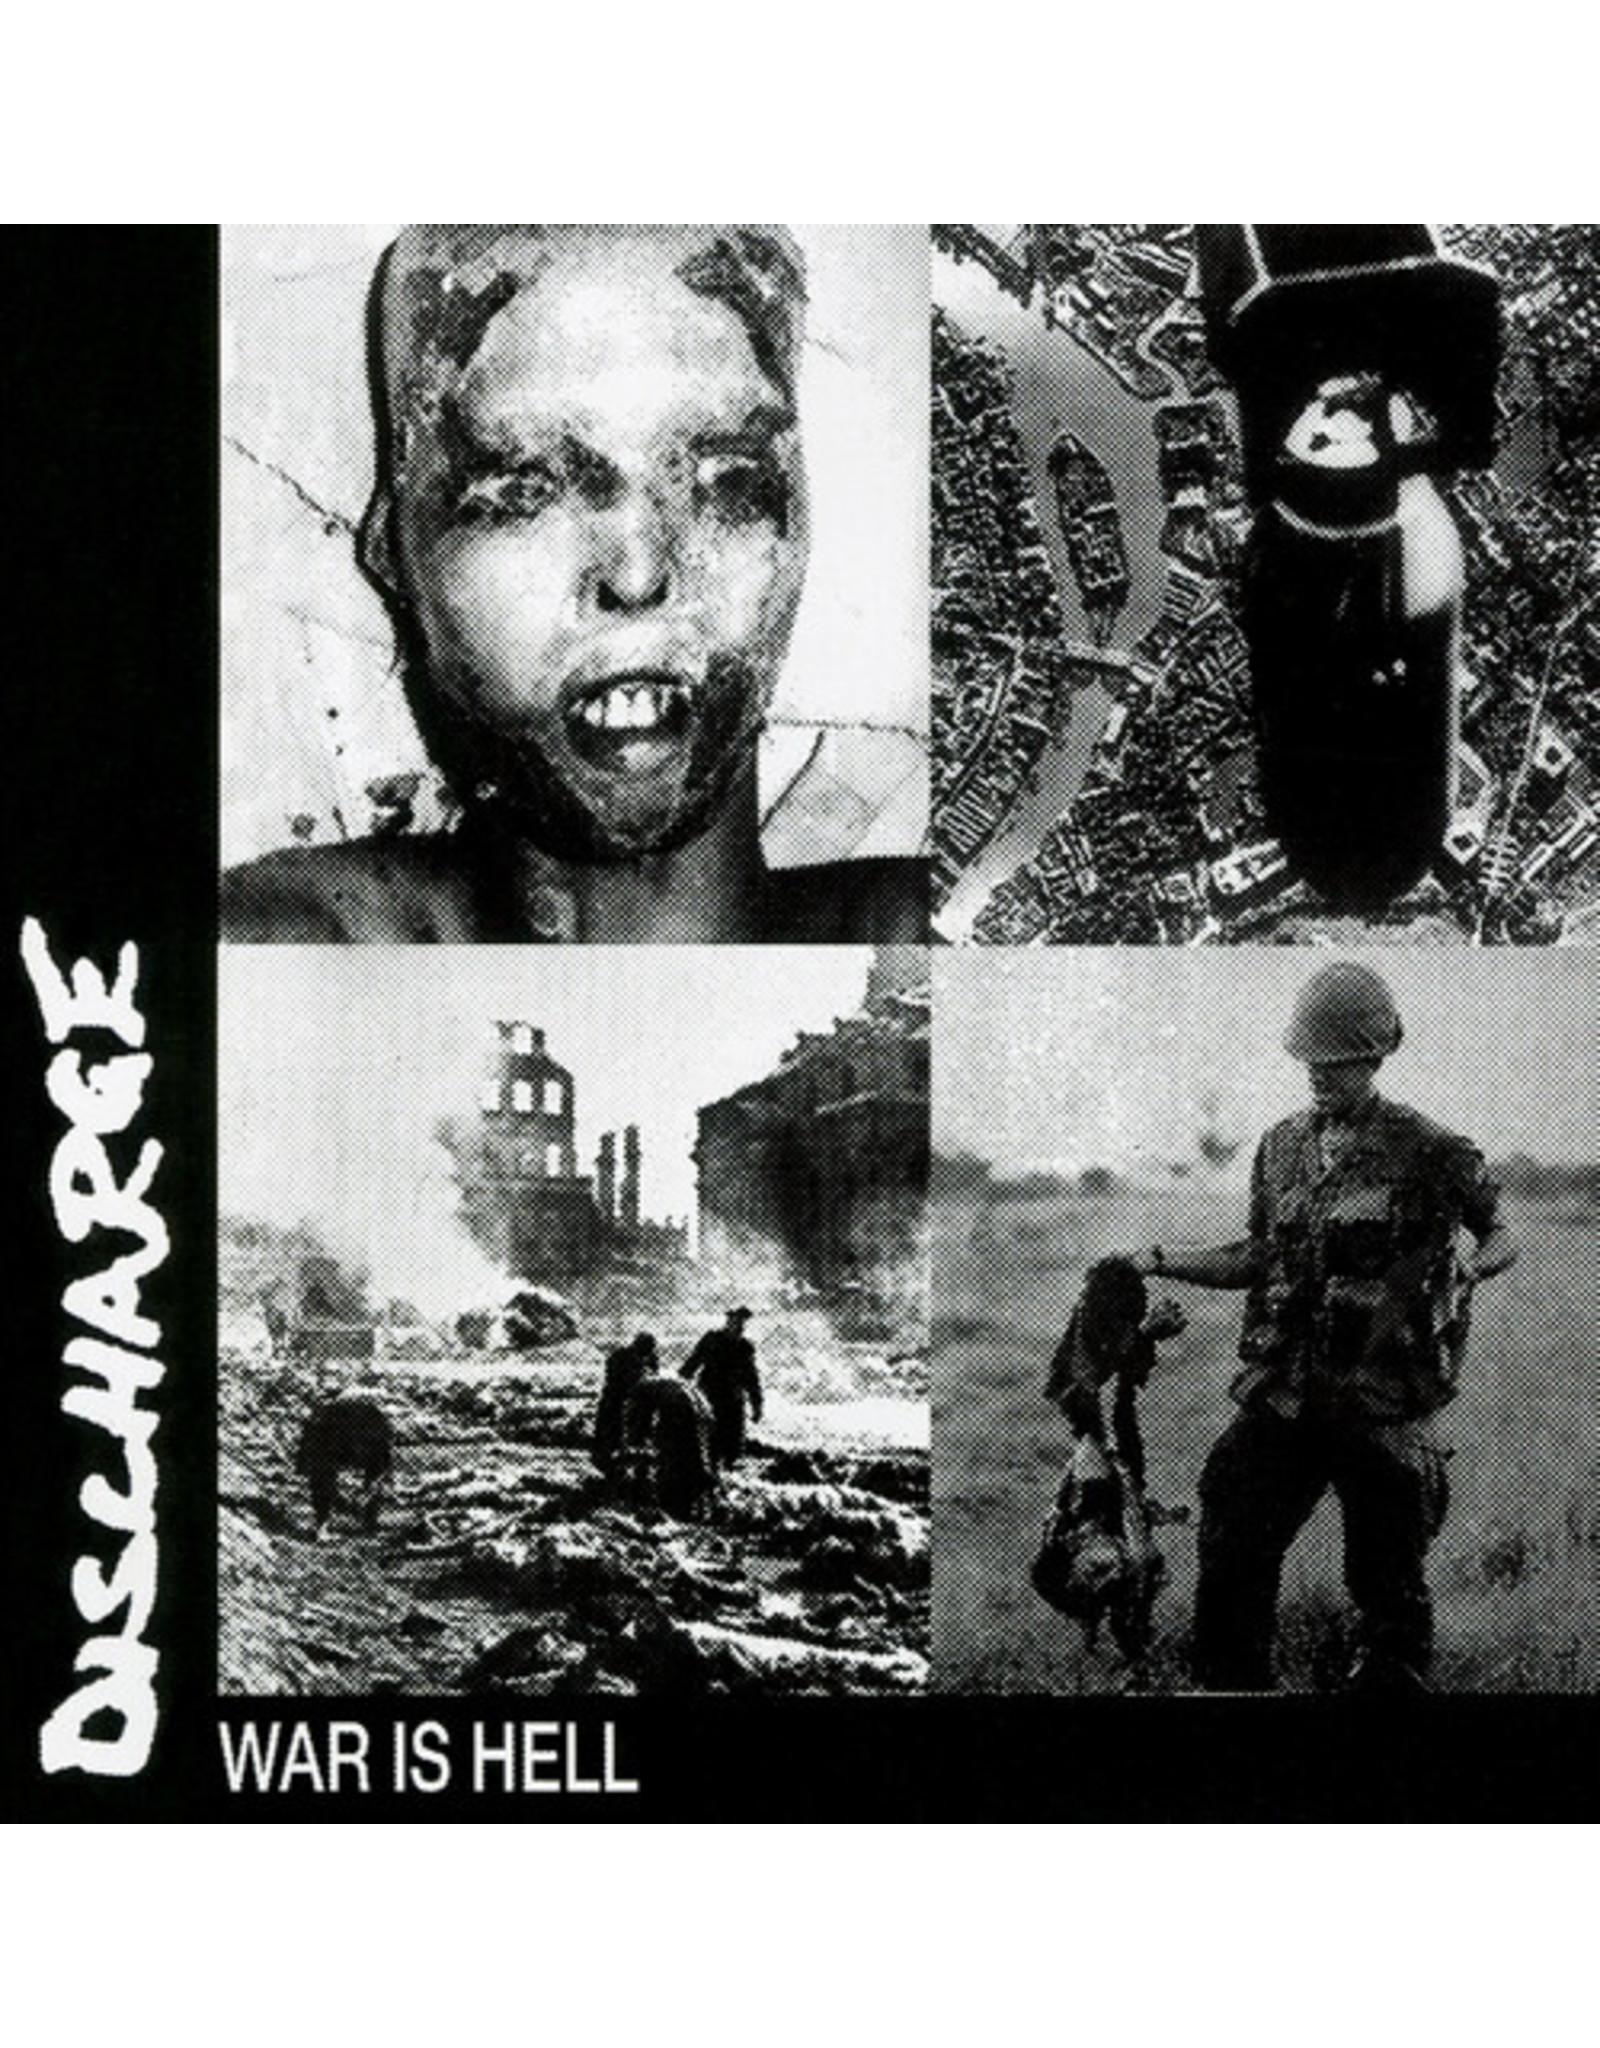 New Vinyl Discharge - War Is Hell (Colored) LP